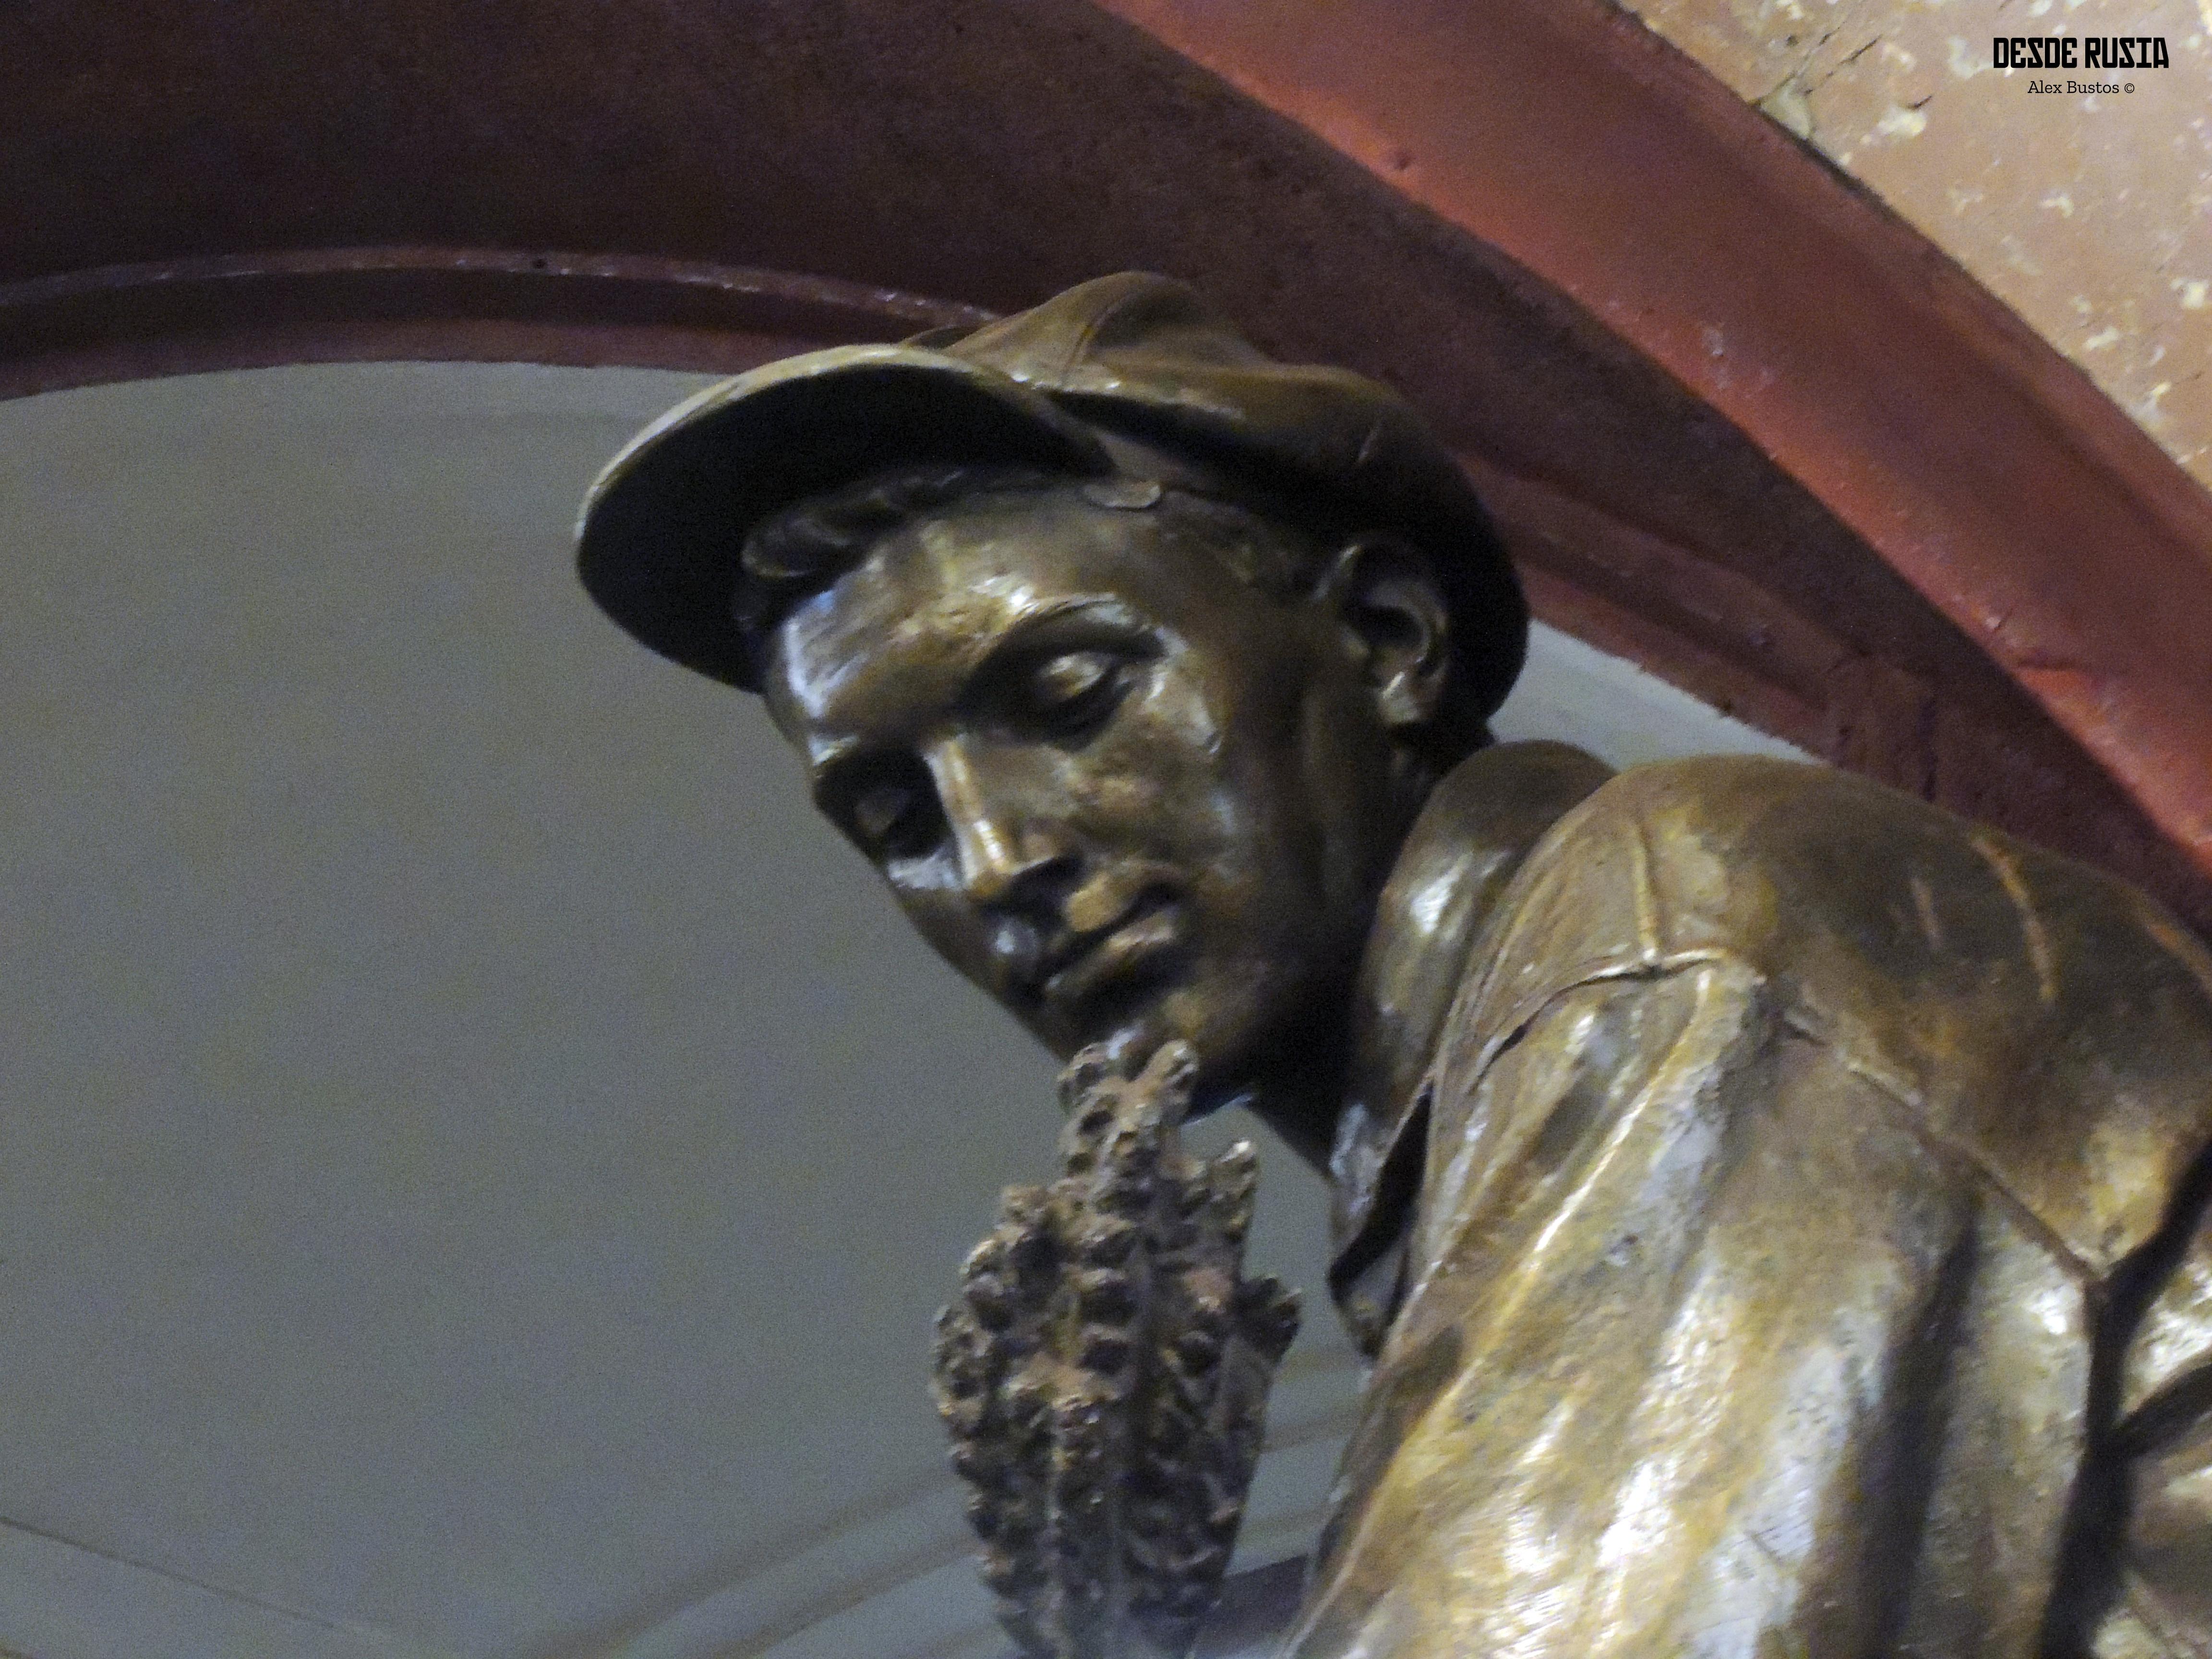 Estatua de la Plaza de la Revolución